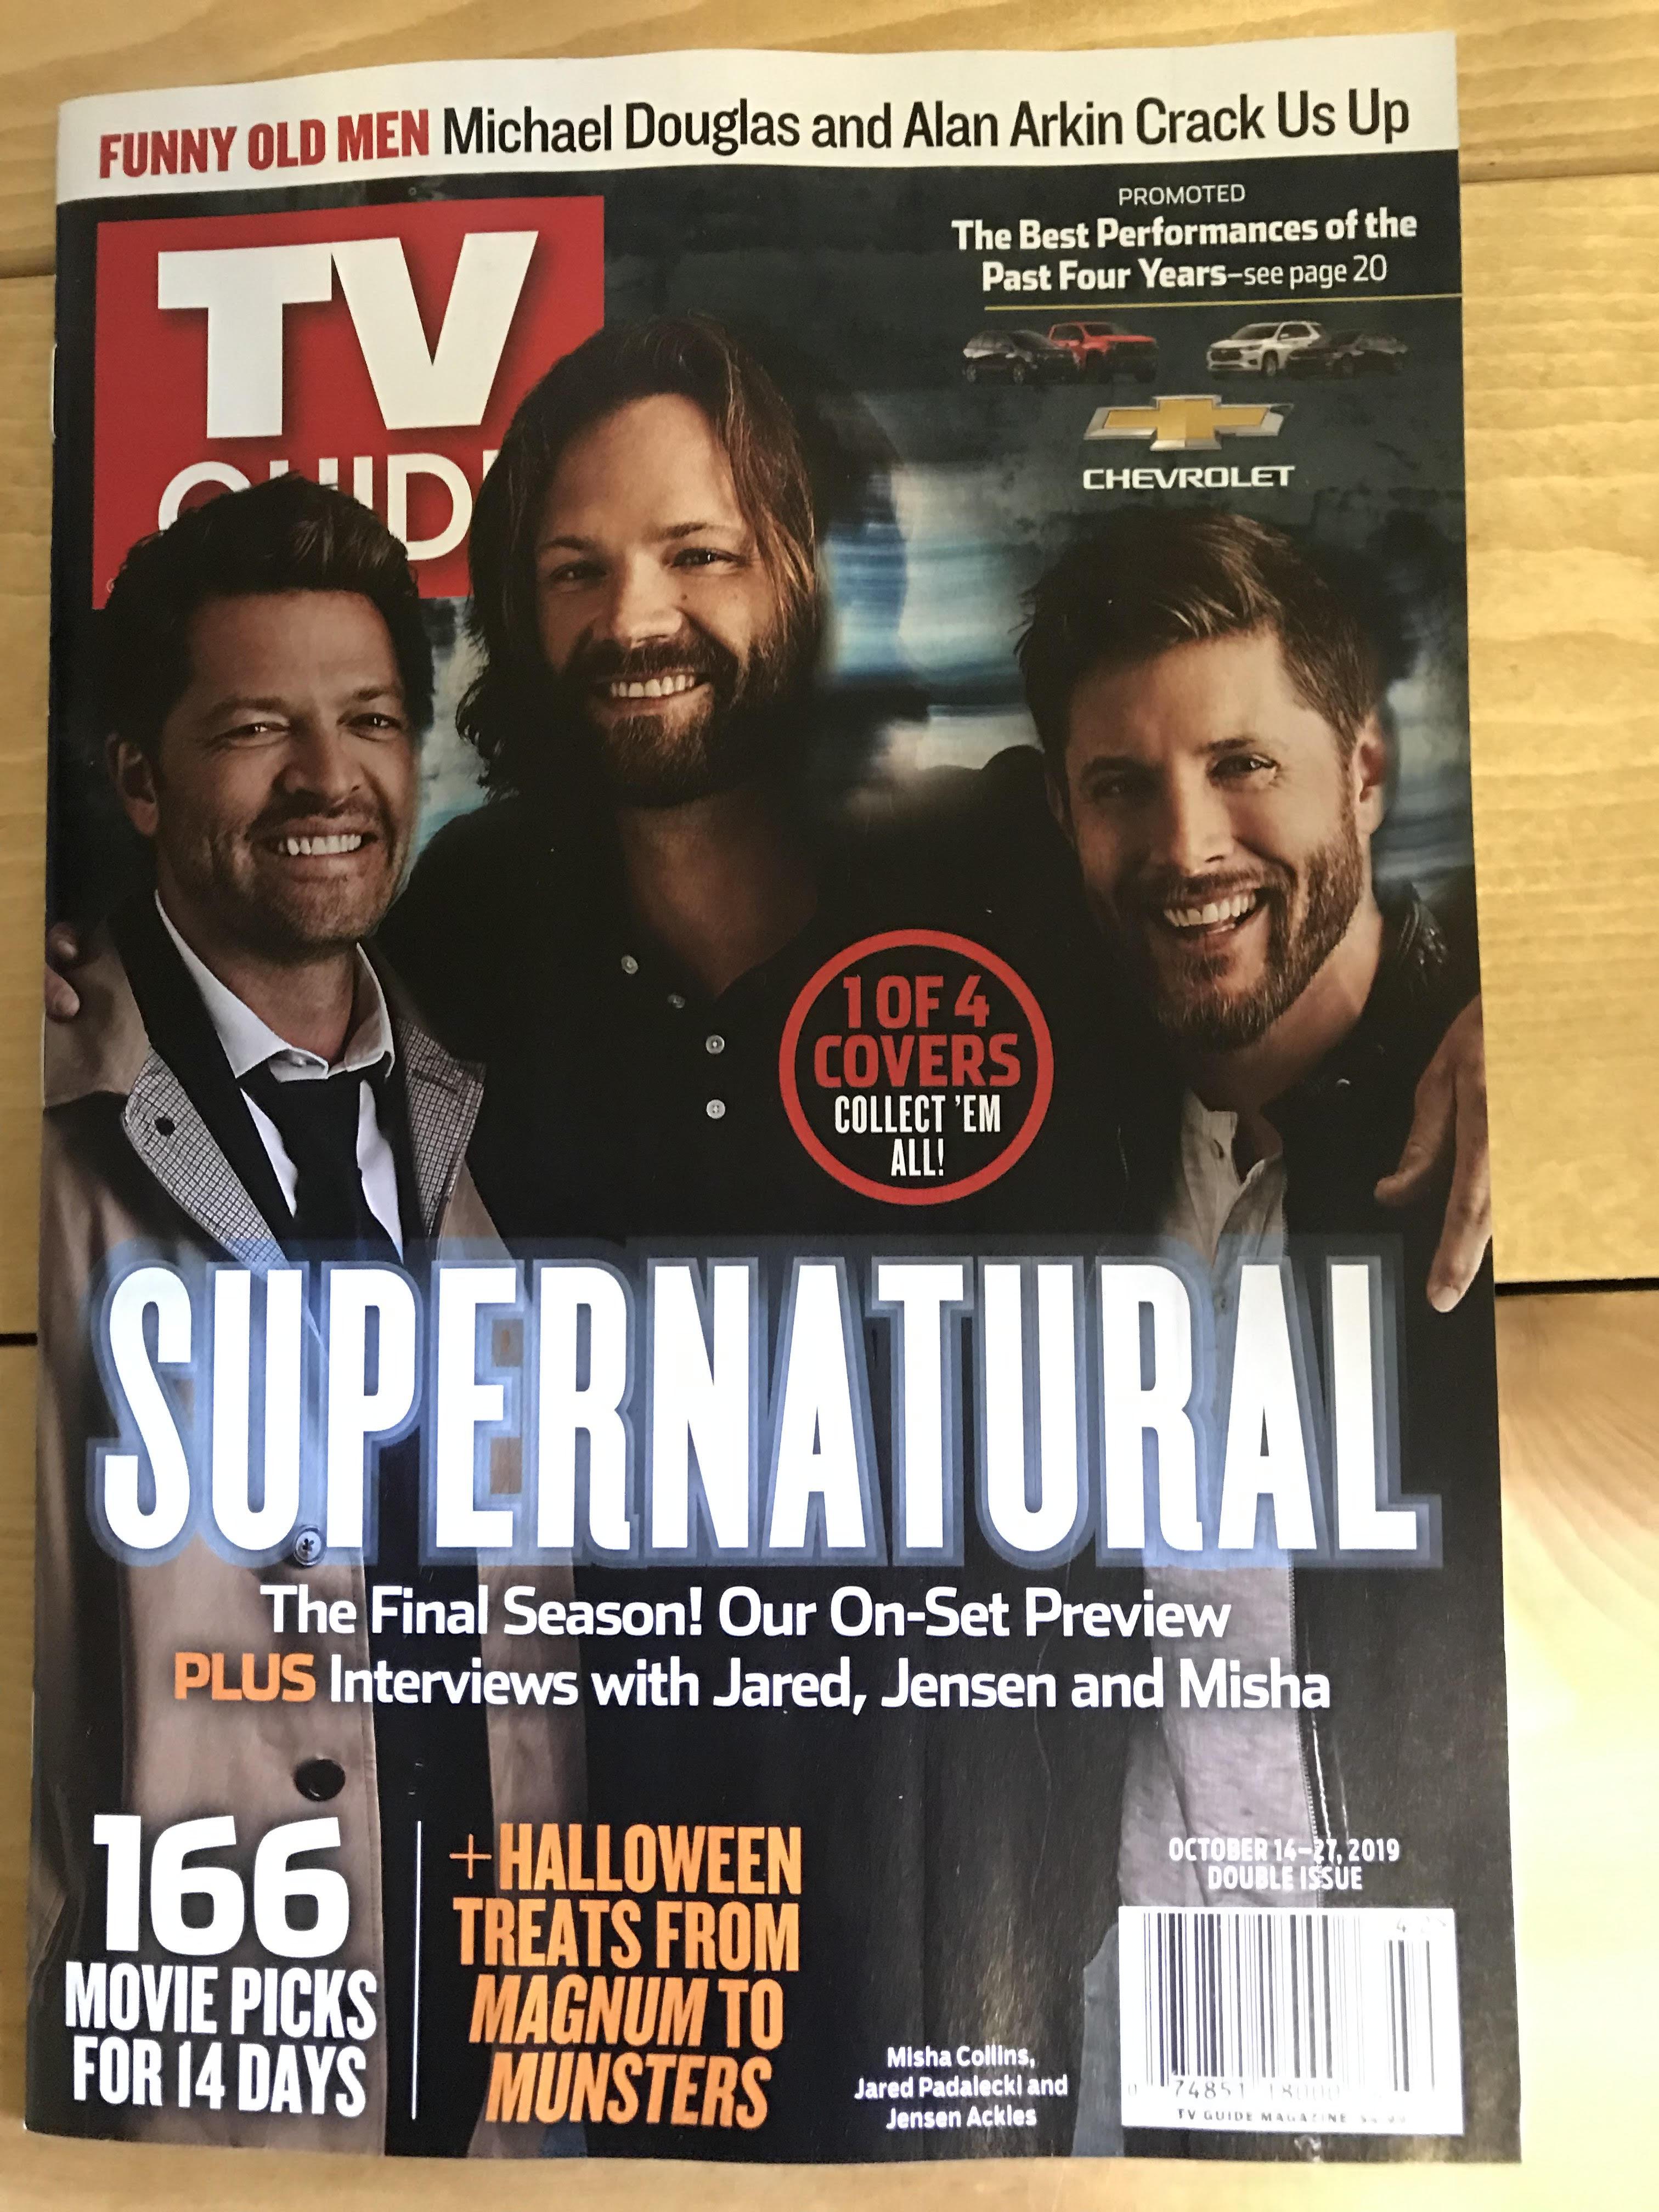 TVguideスーパーナチュラル表紙